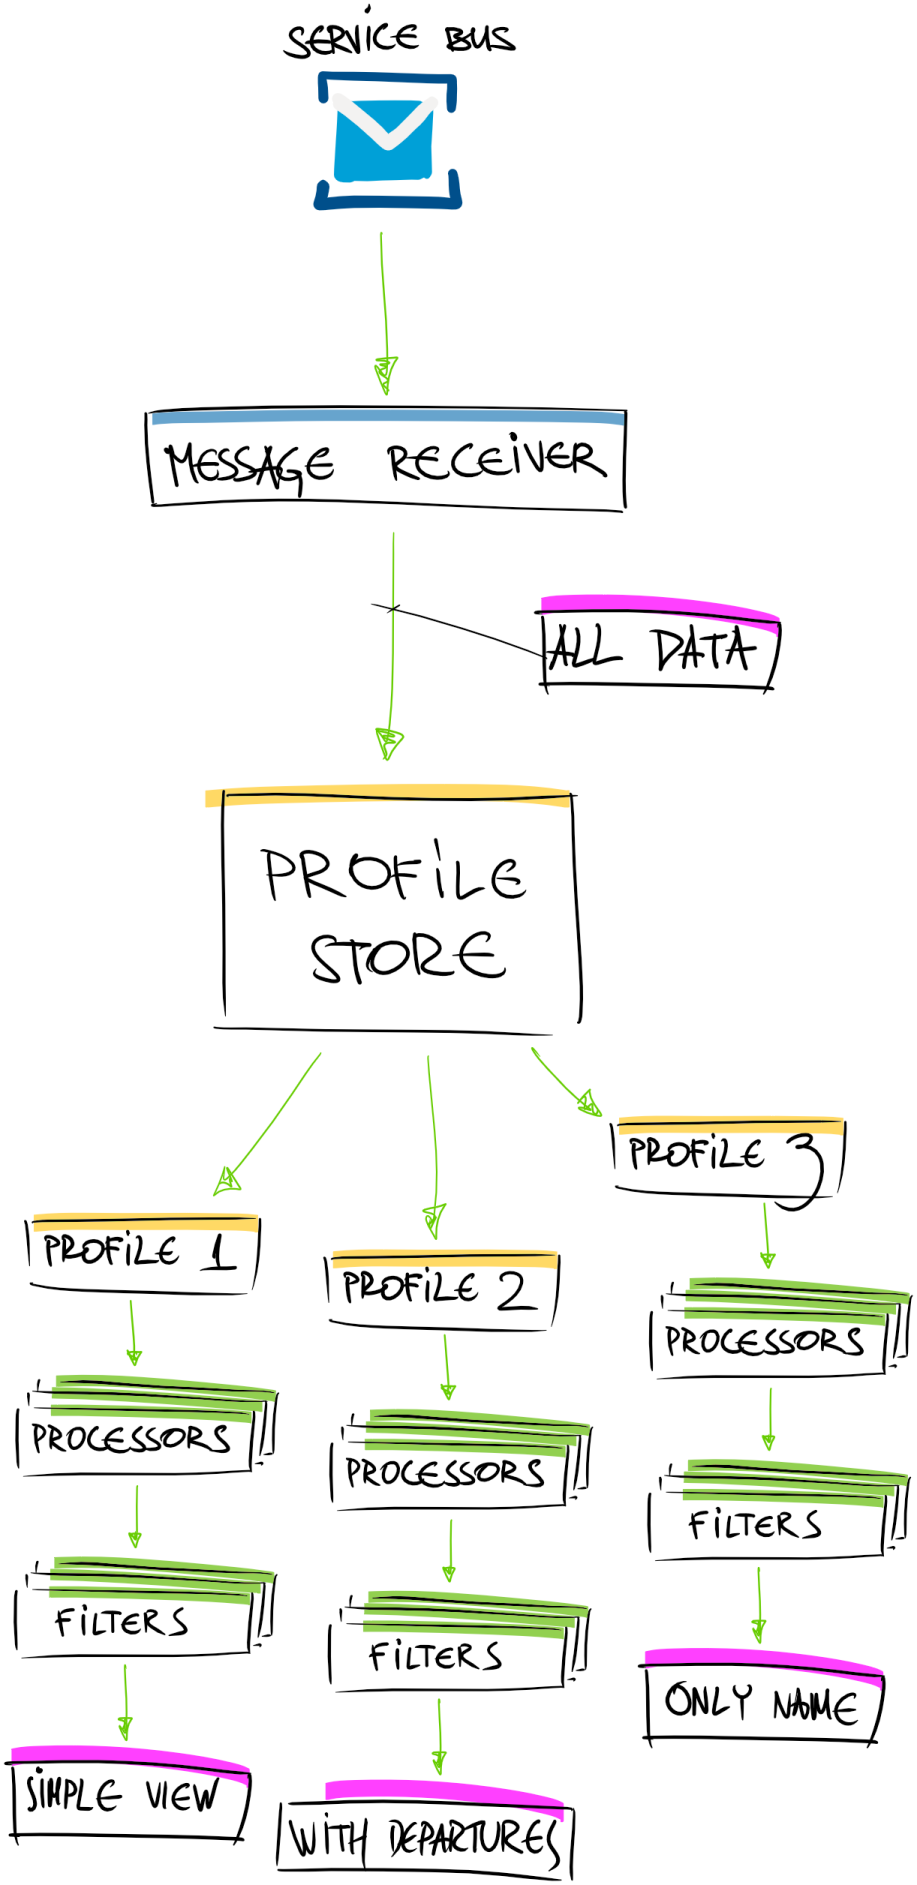 cpu-99-arch-profiles-data-processing